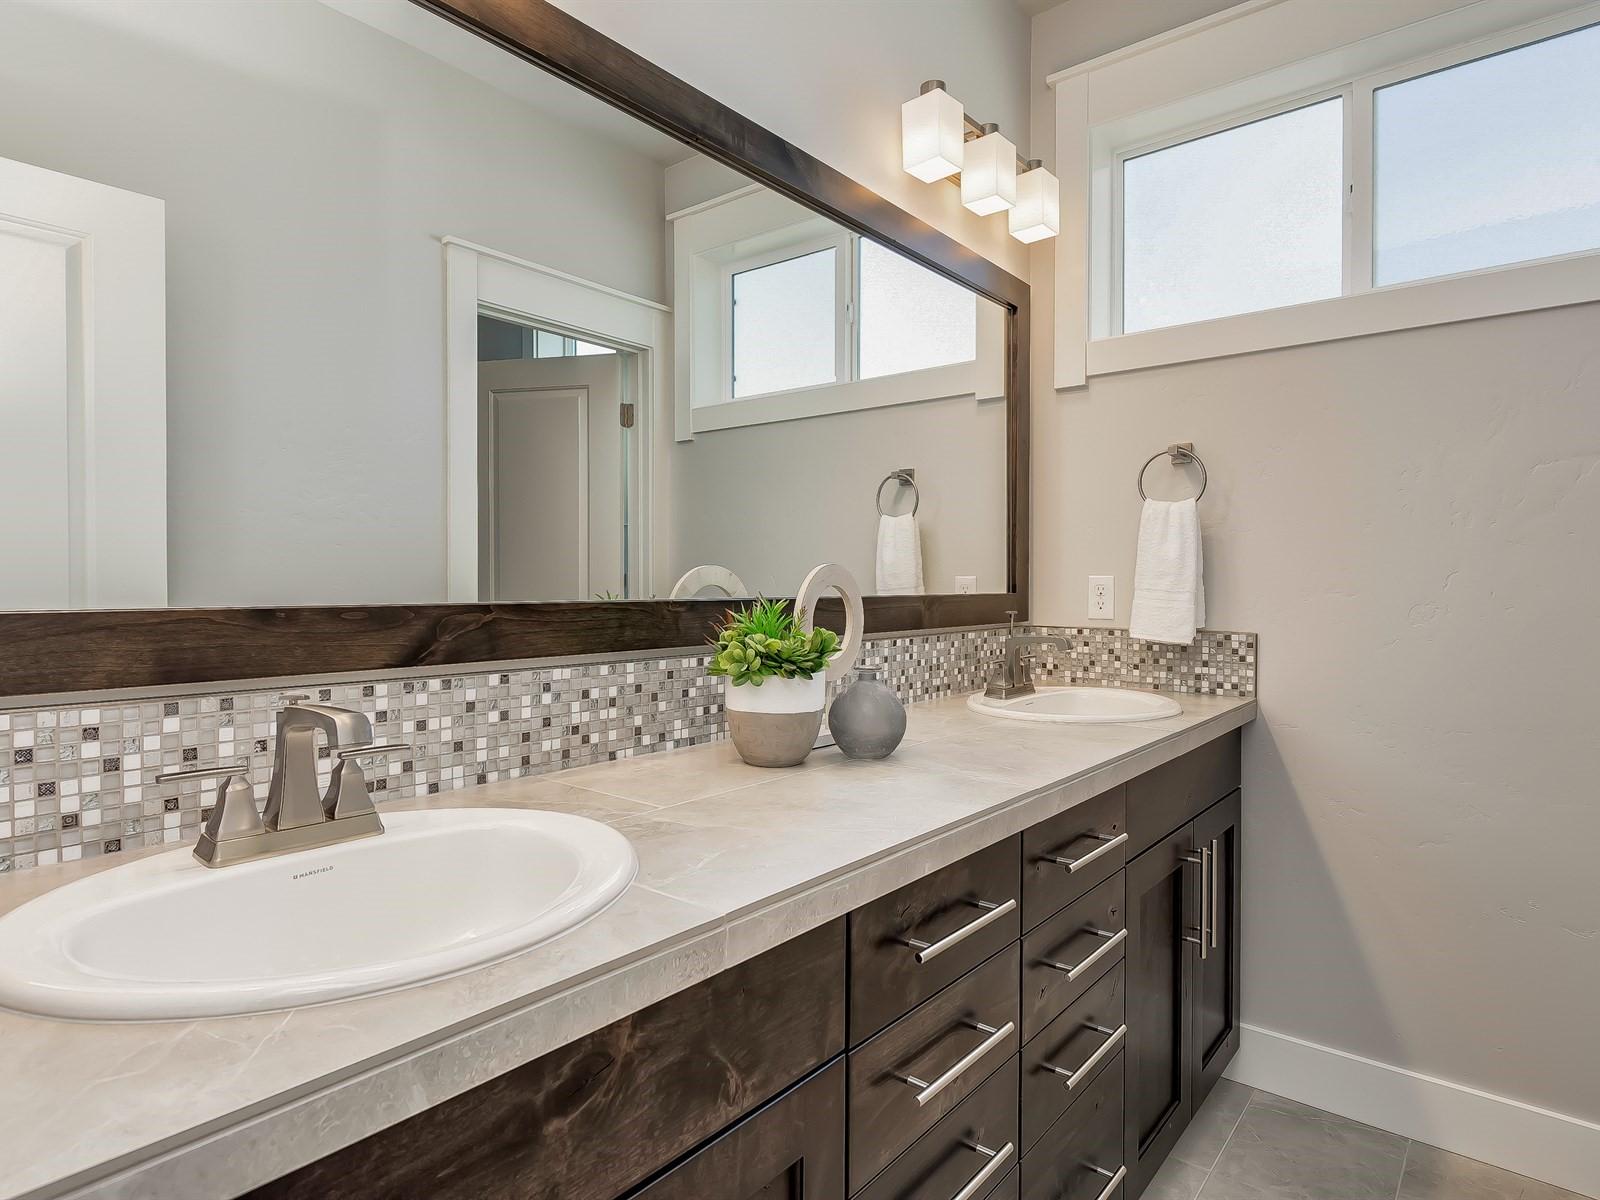 027_Bathroom .jpg